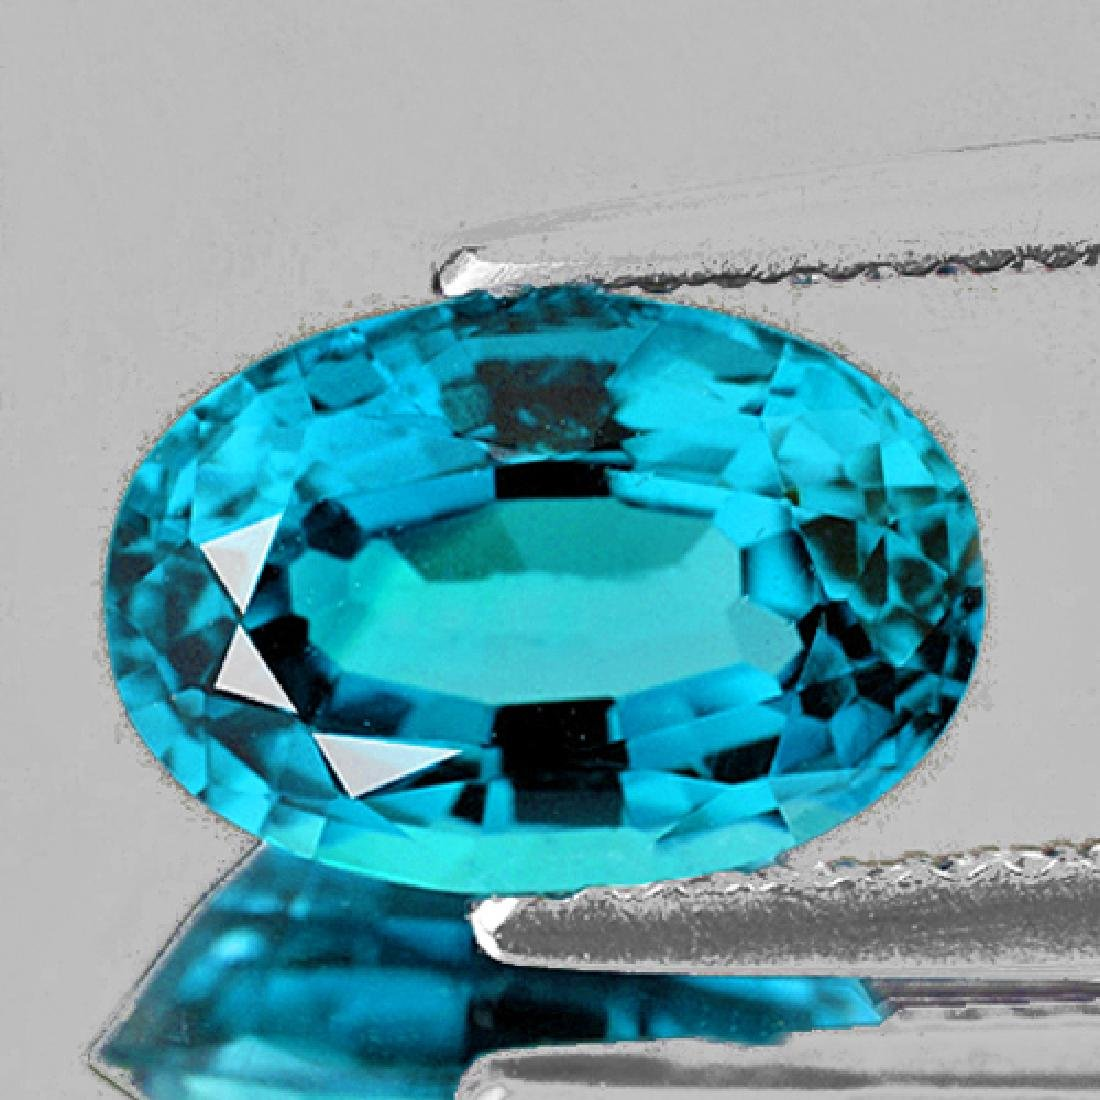 Natural AAA Blue Zircon 2.52 Ct - Flawless